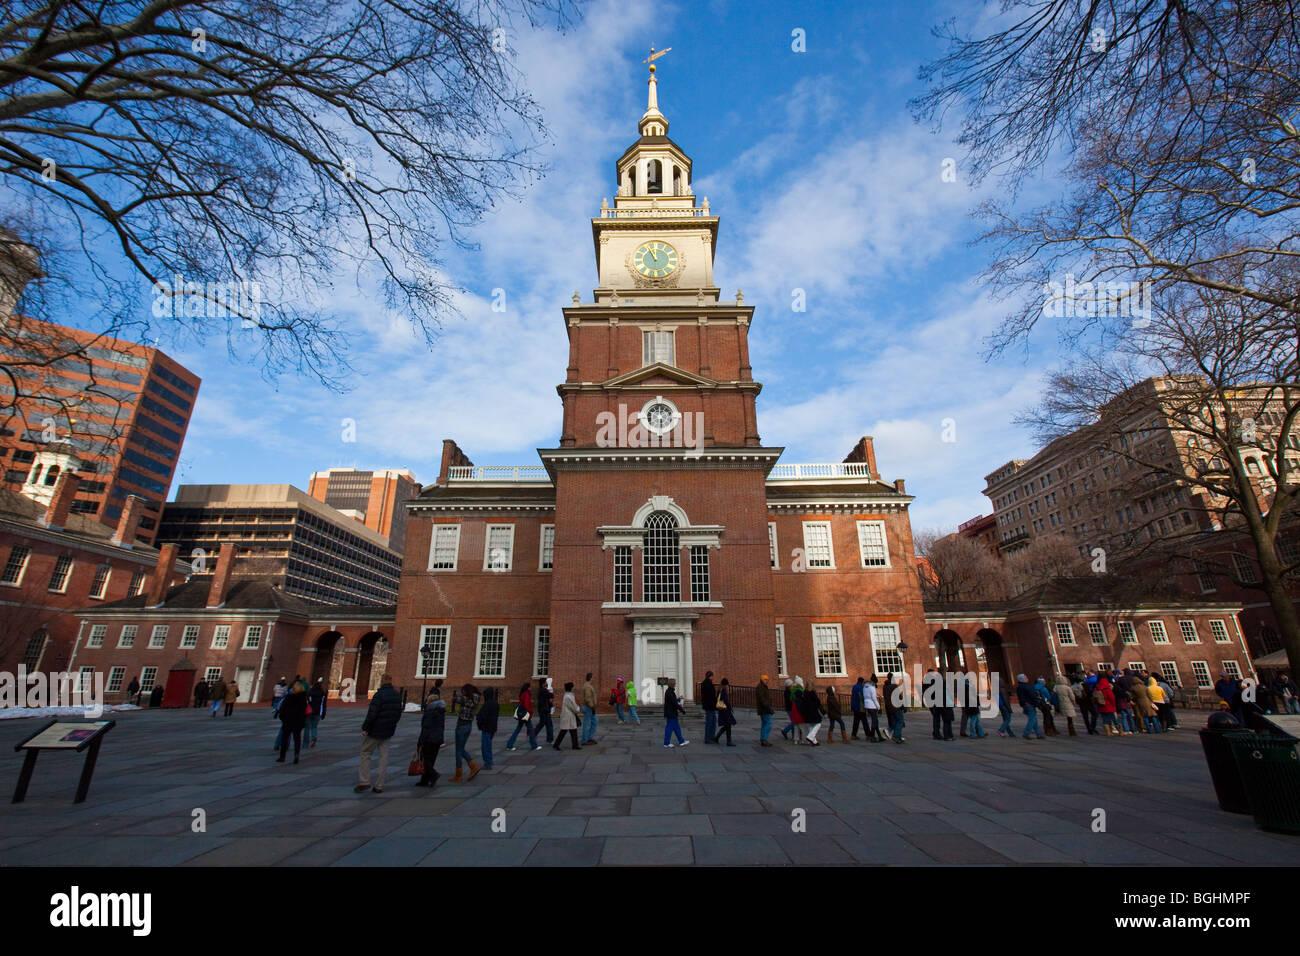 L'Independence Hall de Philadelphie, Pennsylvanie Photo Stock